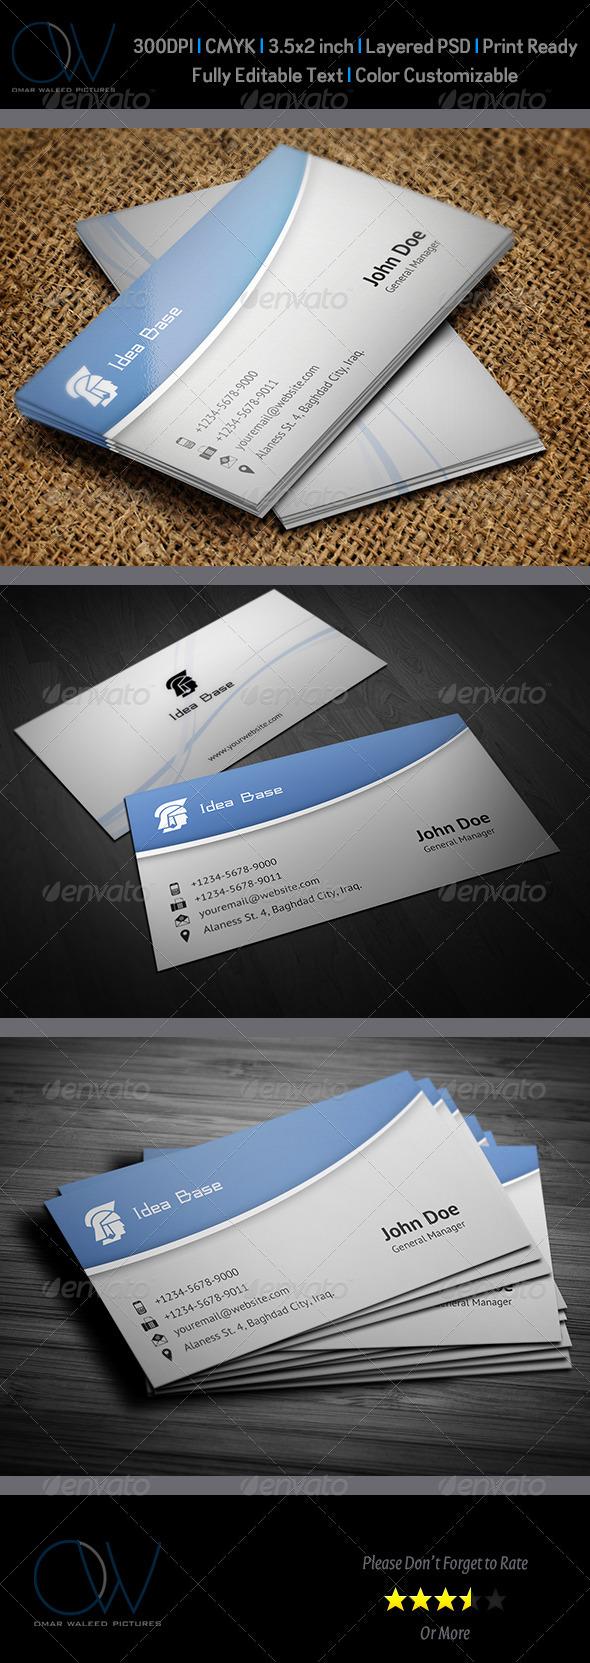 Corporate Business Card Vol.3 - Corporate Business Cards